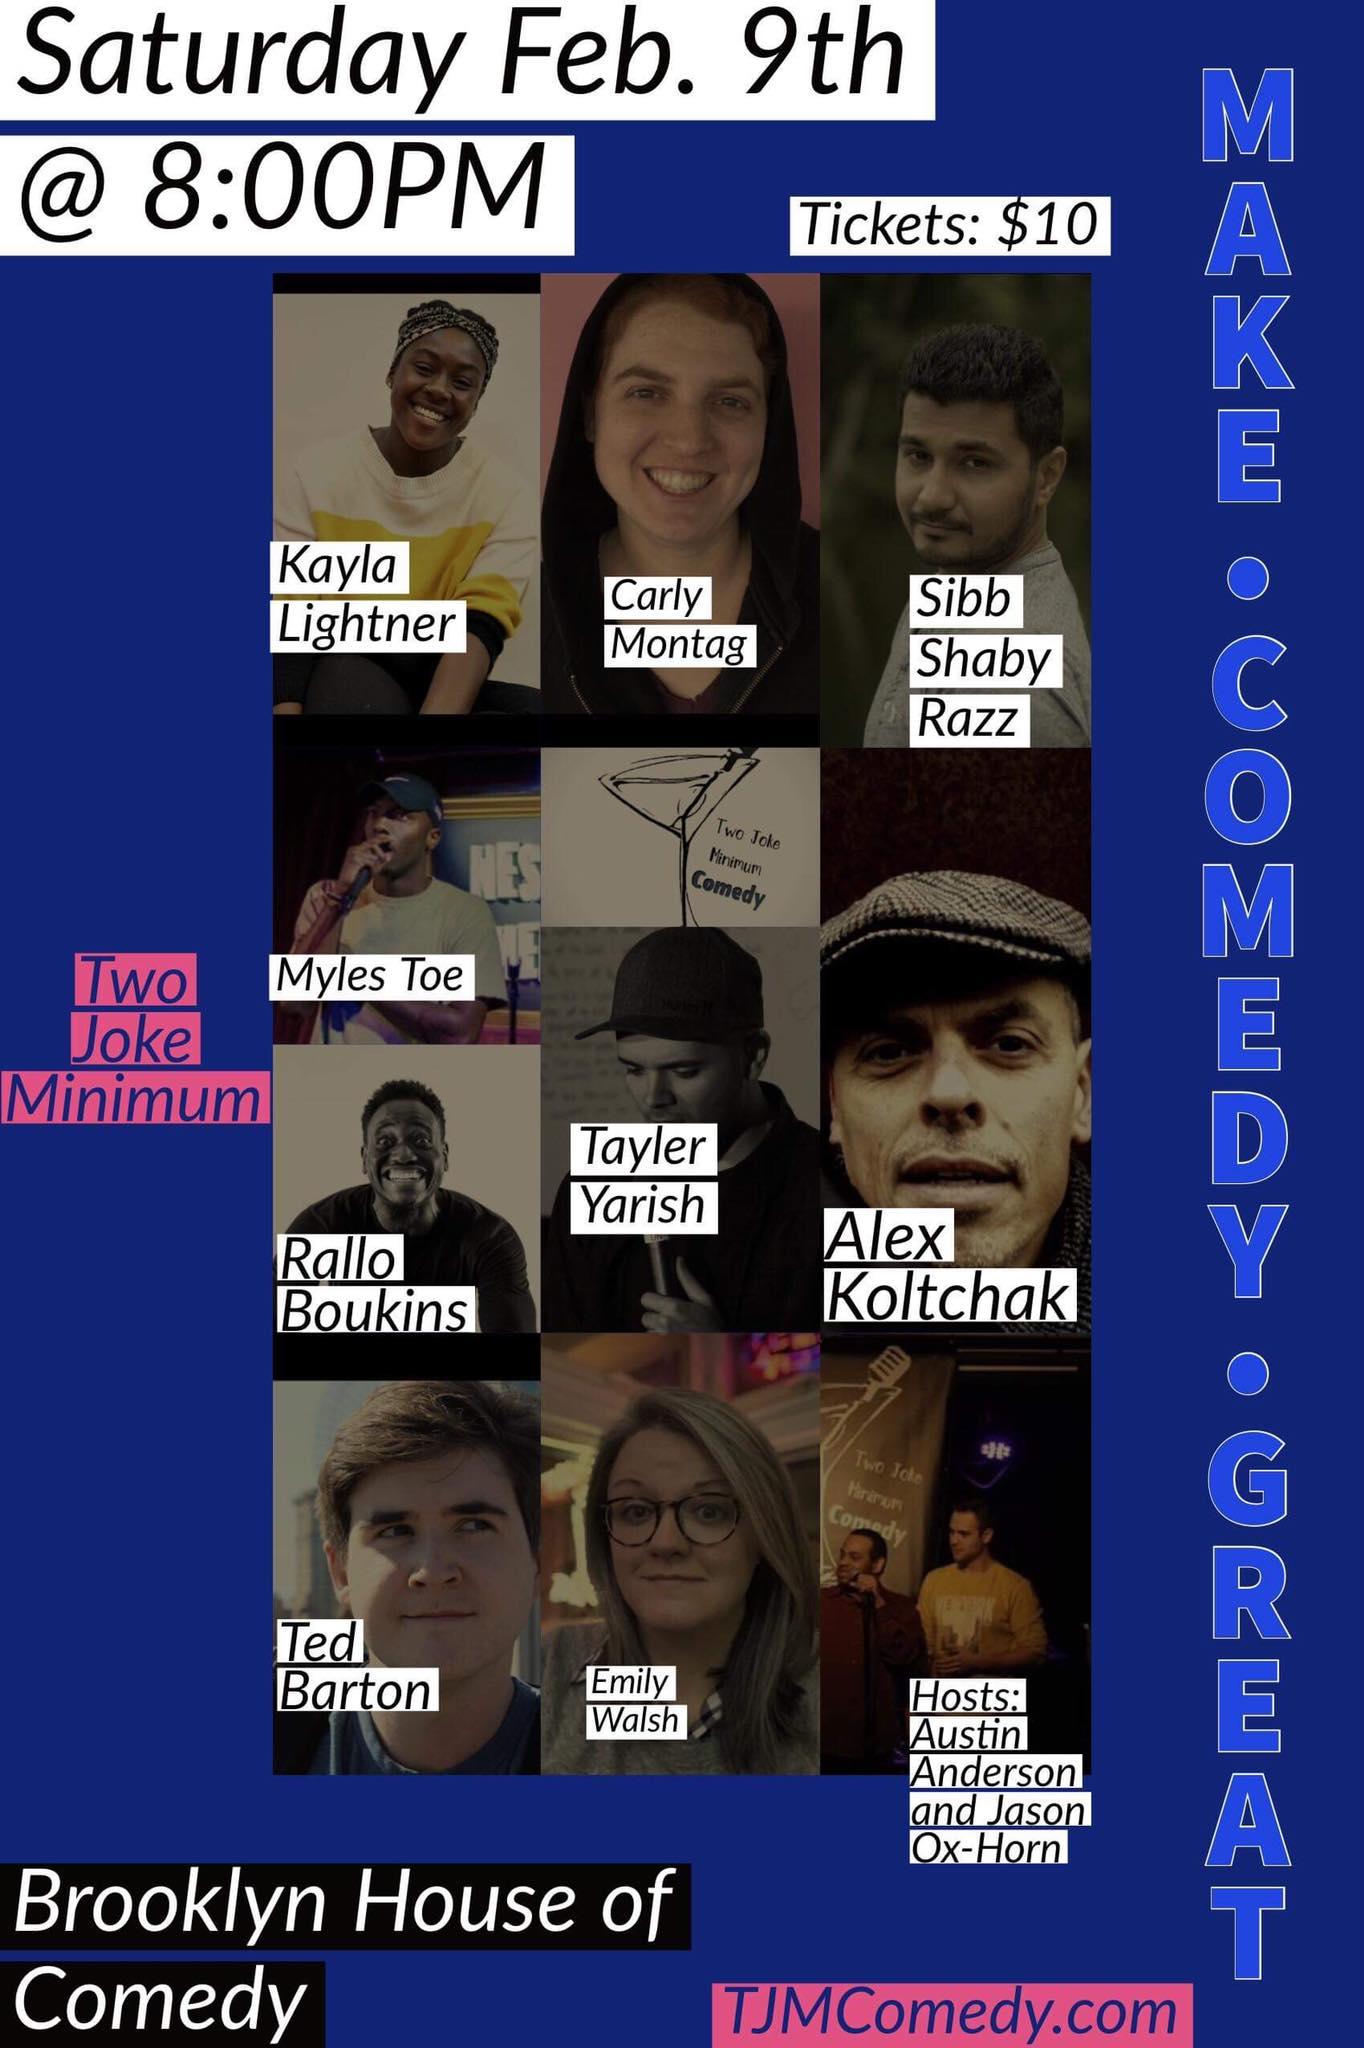 Two Joke Minimum Saturday, Feb 9th 8:oopm-9:3opm Brooklyn House of Comedy | 1165 Bedford Ave. | Brooklyn, NY 11216